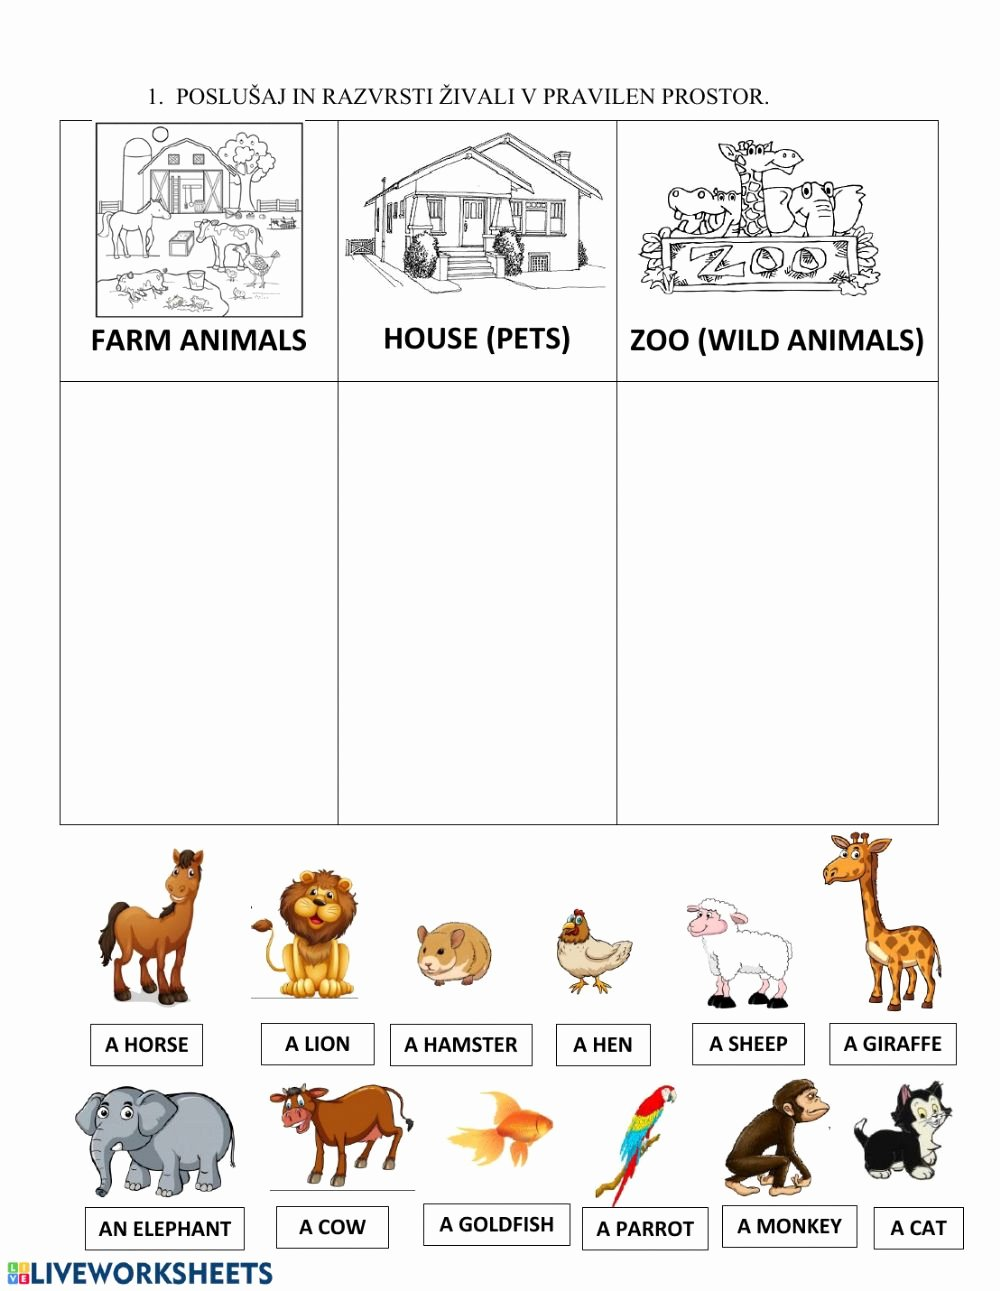 Zoo Animal Worksheets for Preschoolers Inspirational Animals Pet Farm Zoo Interactive Worksheet